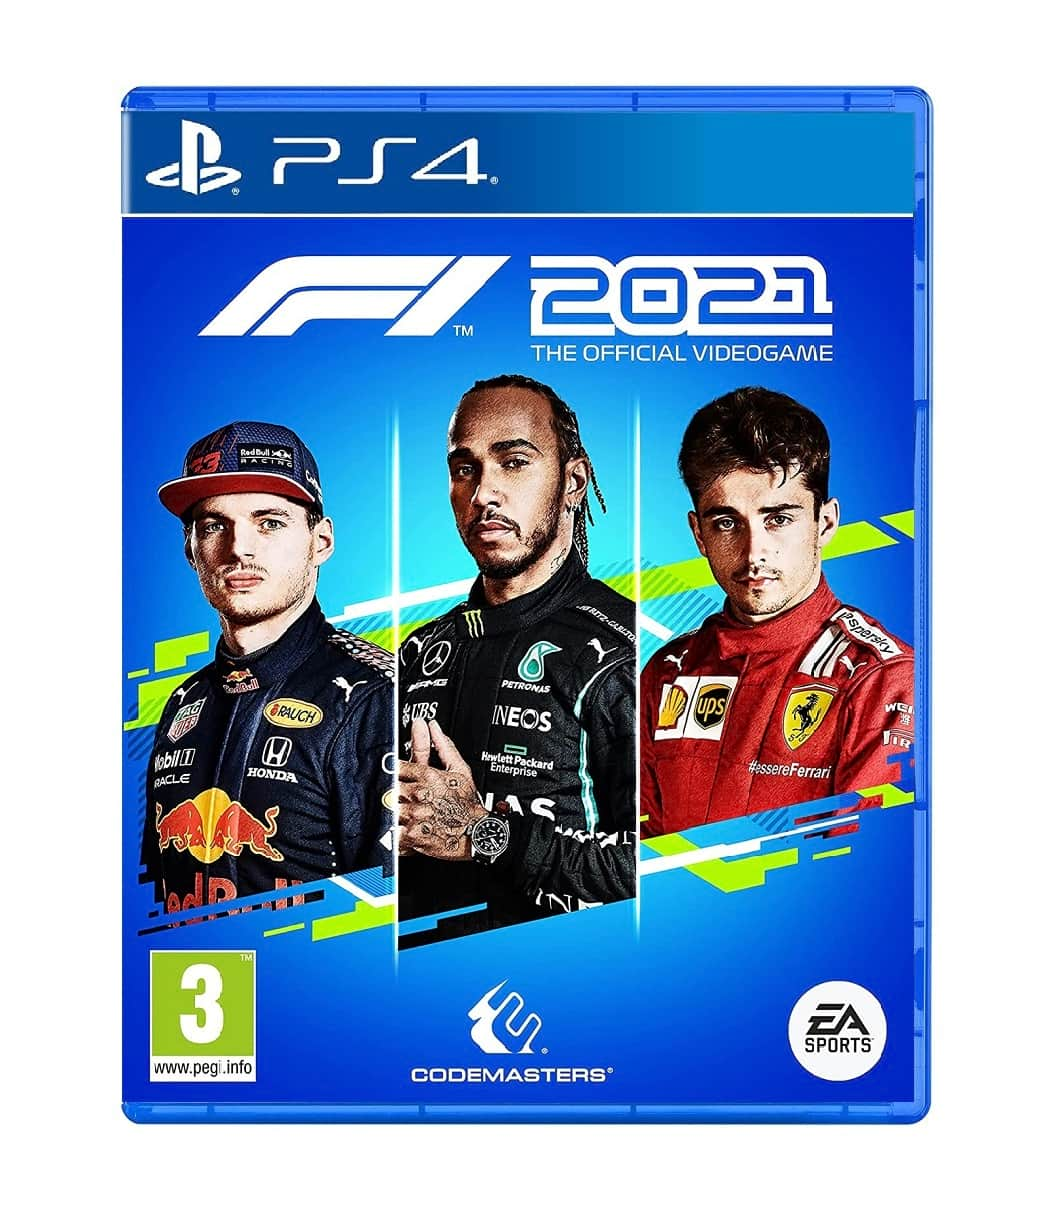 F1 2021 Sosogames